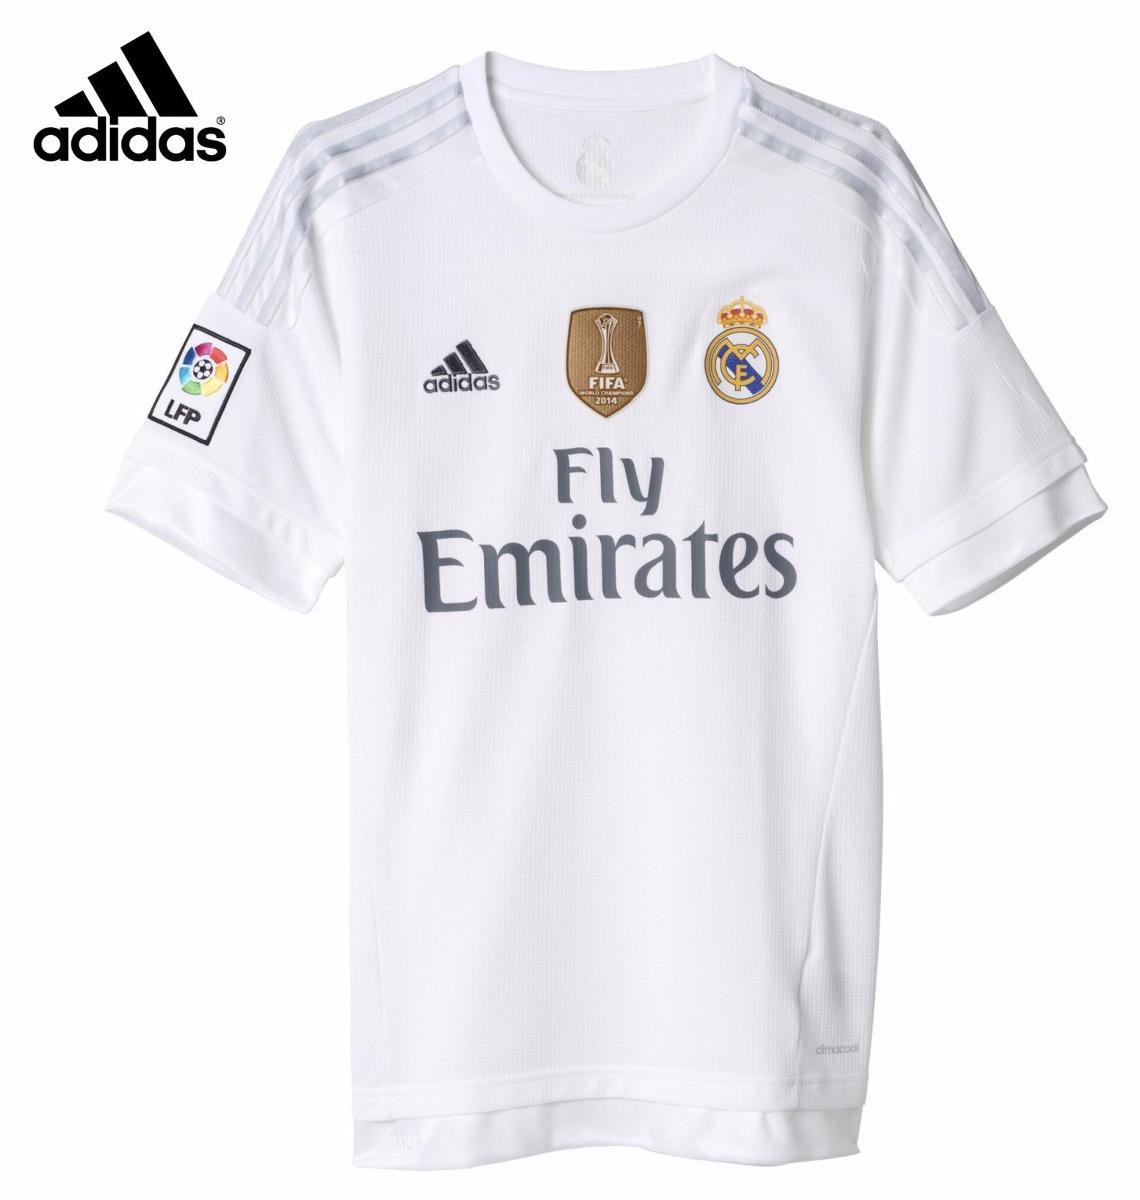 afa1f8865de51 Camiseta Real Madrid James 2015 2016 Logo Champions Campeón ...